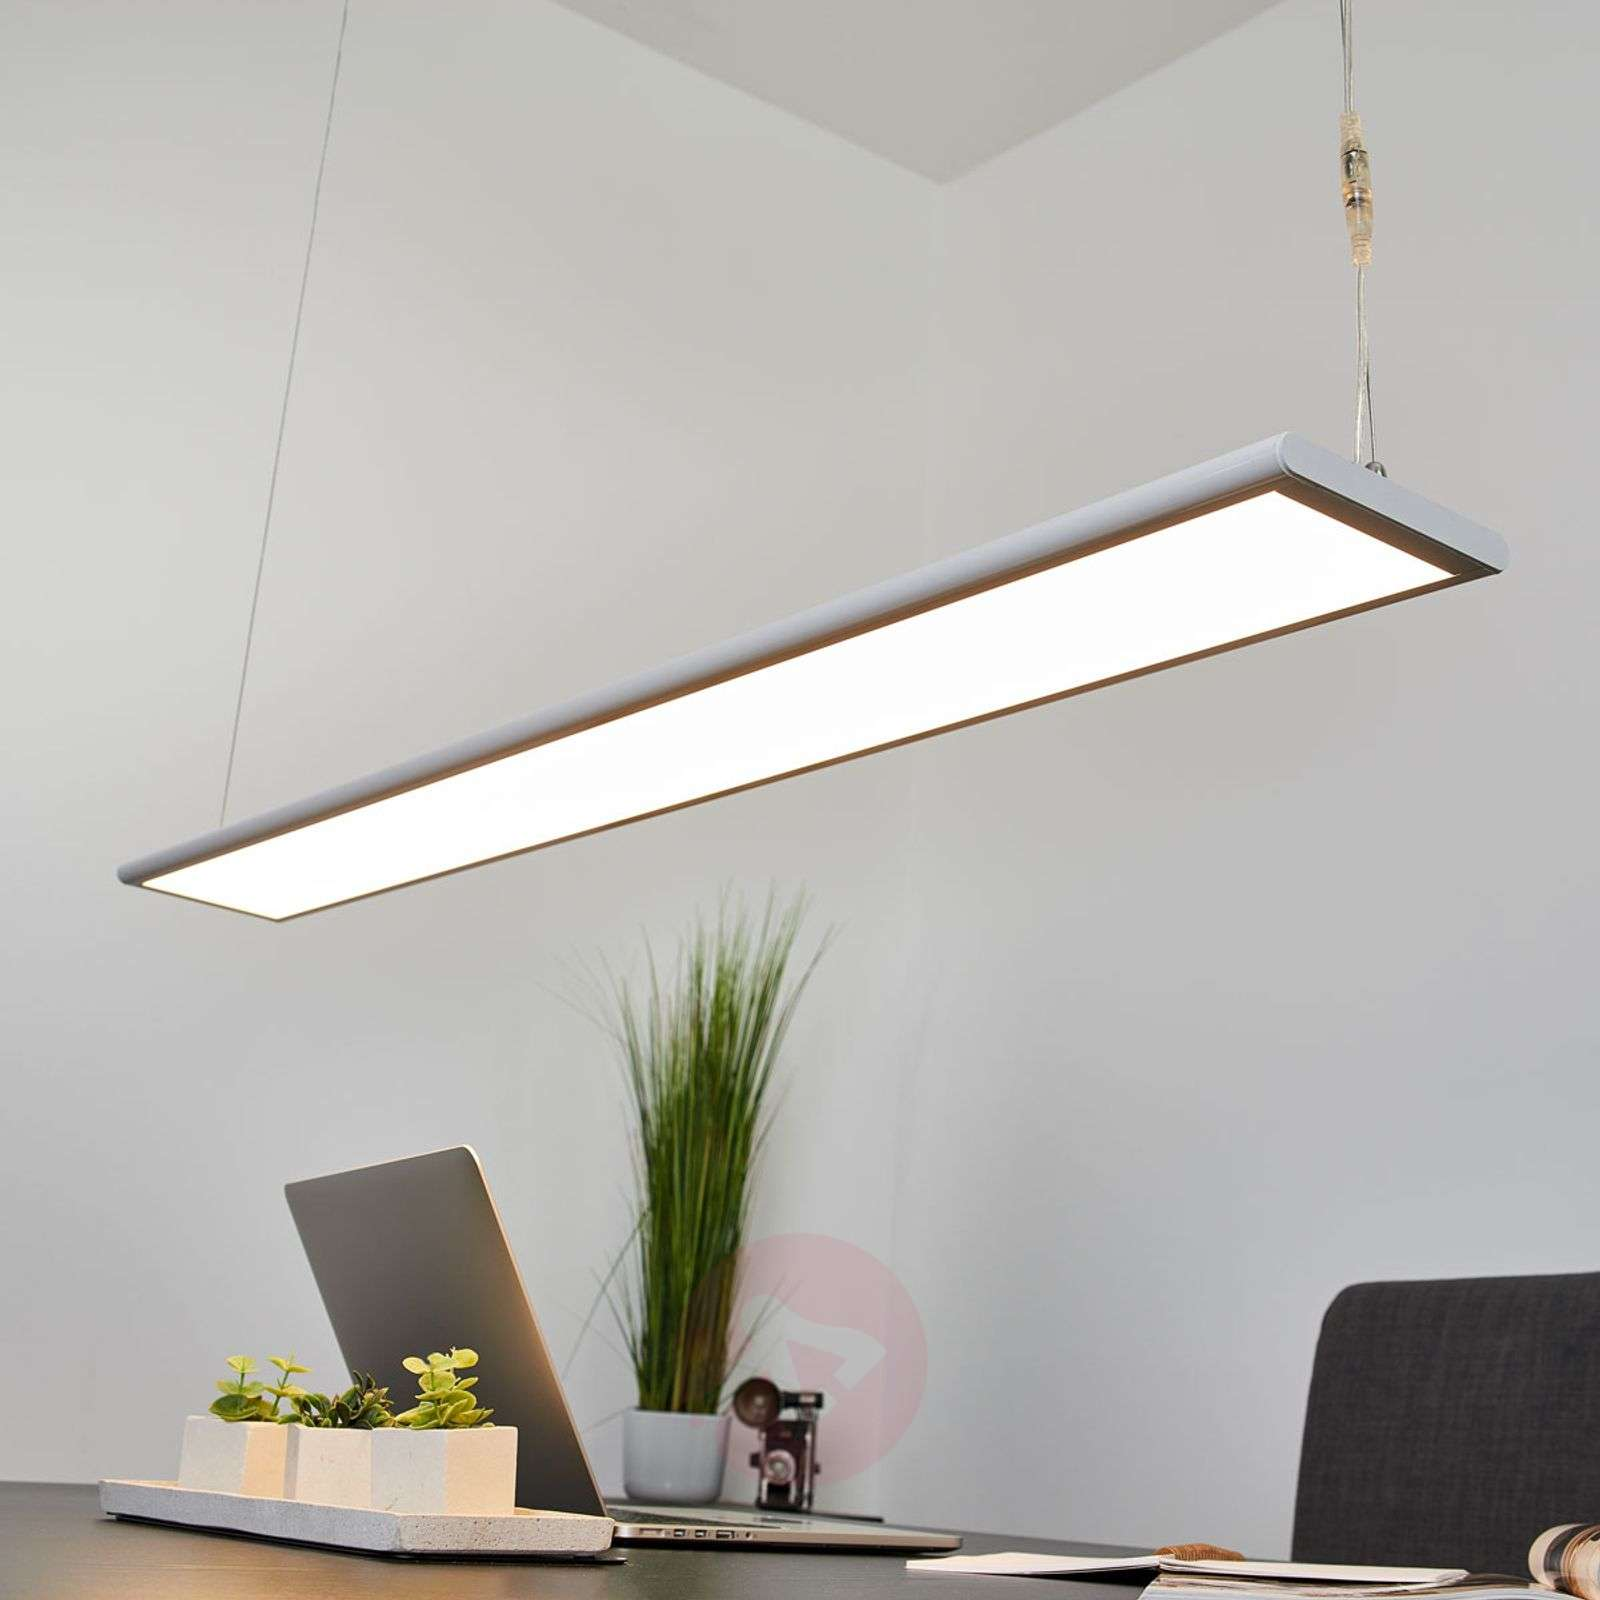 office hanging lights. Dimmable LED Office Hanging Light Samu, 40.5 W-9967020-01 Lights I